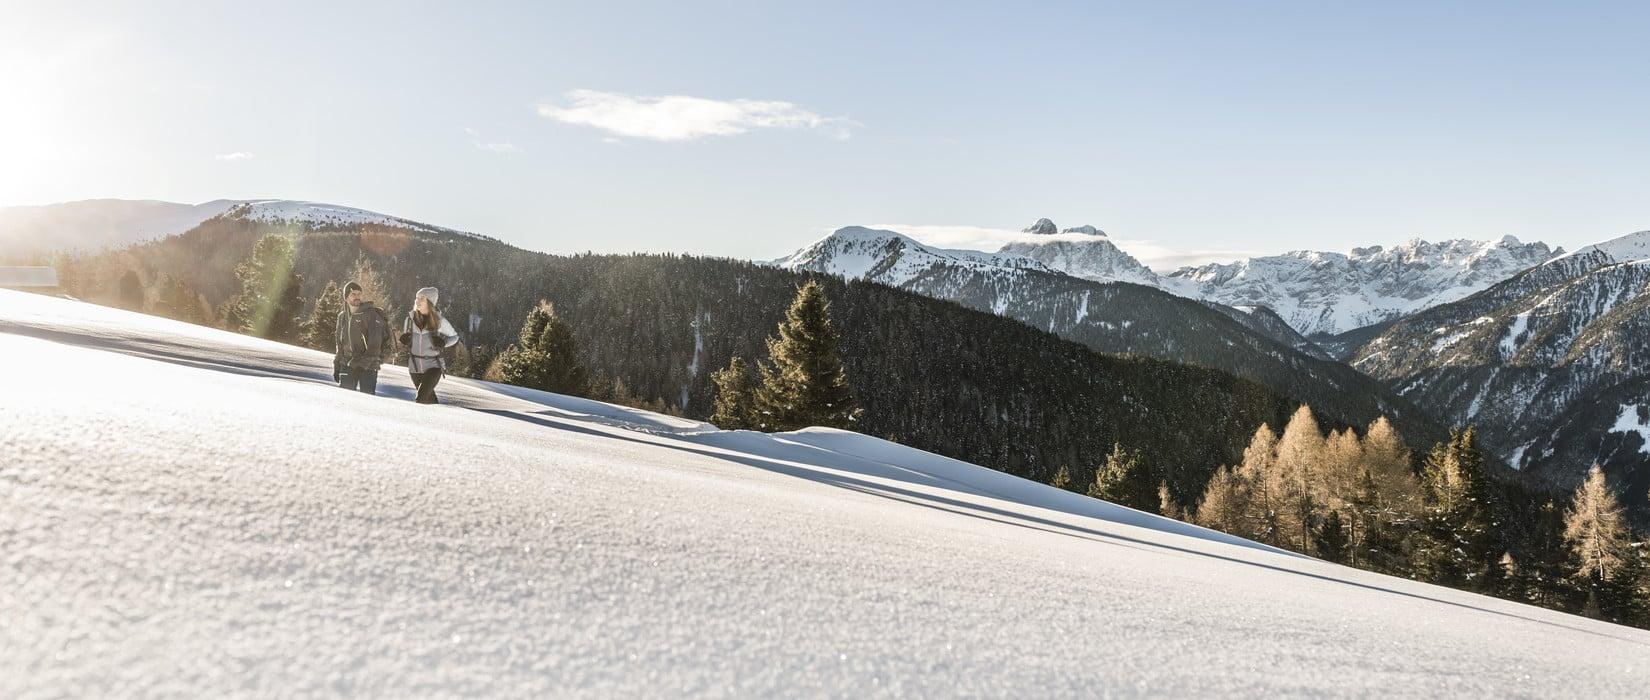 Vacanze invernali in Alto Adige